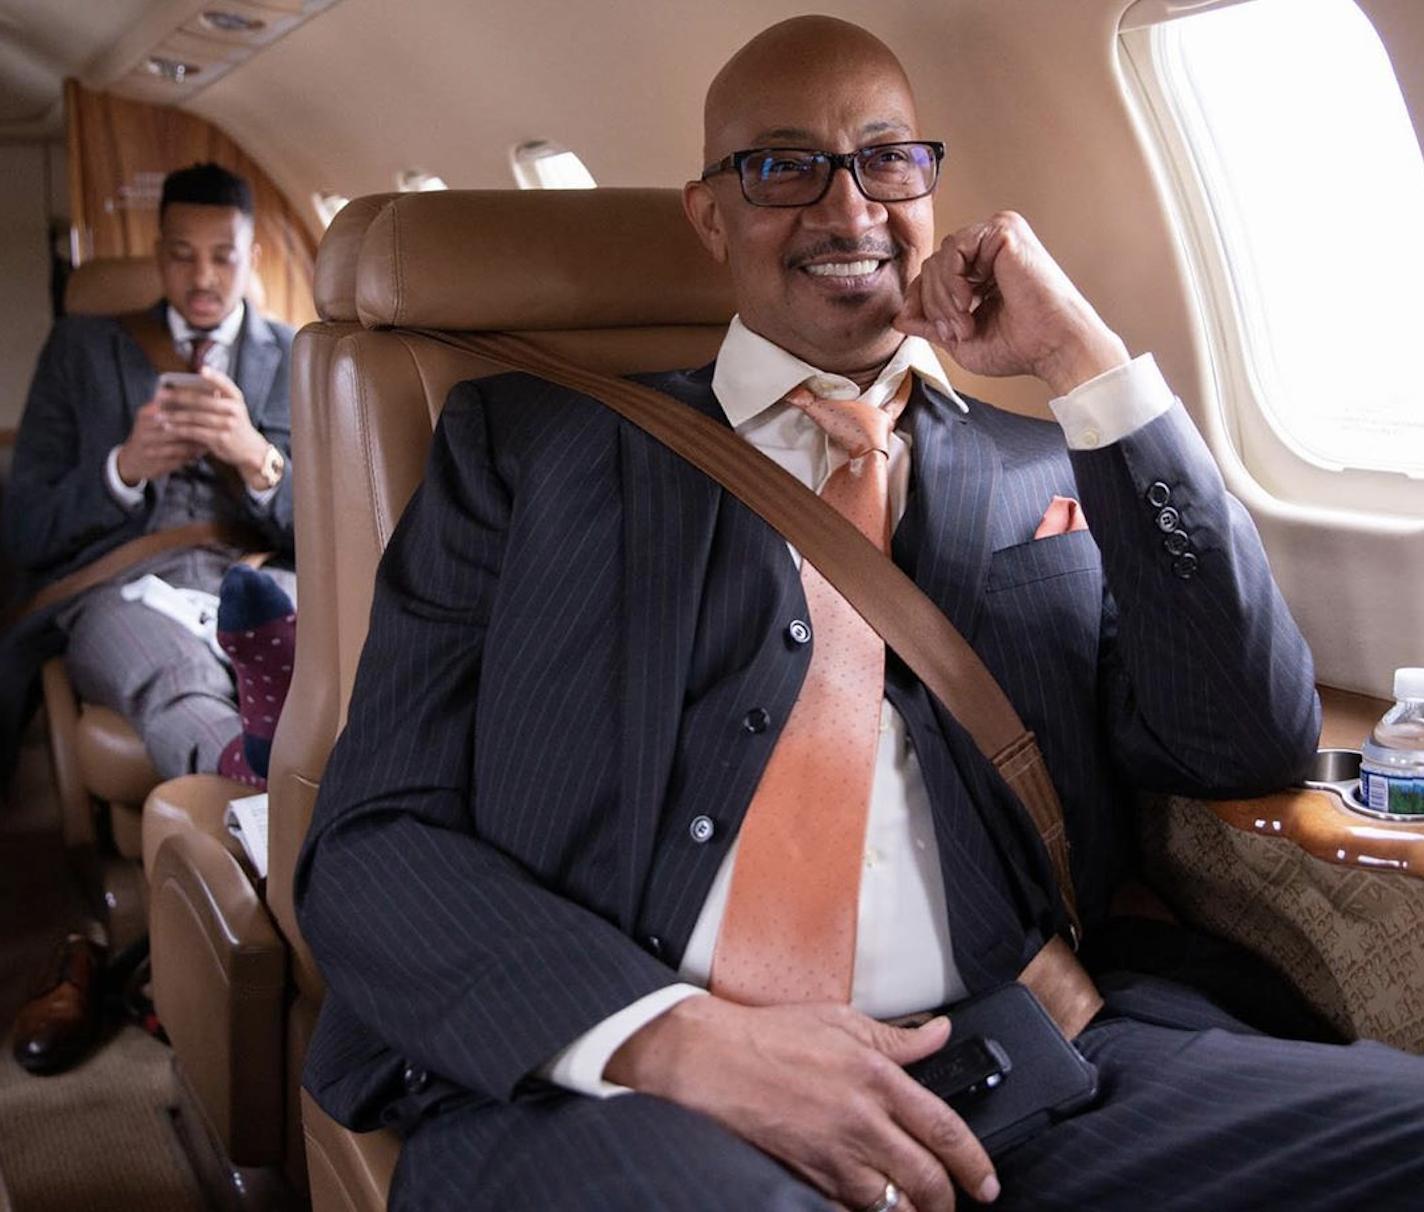 CJ-麦科勒姆更新社媒晒出父亲照片并祝父亲节日幸福